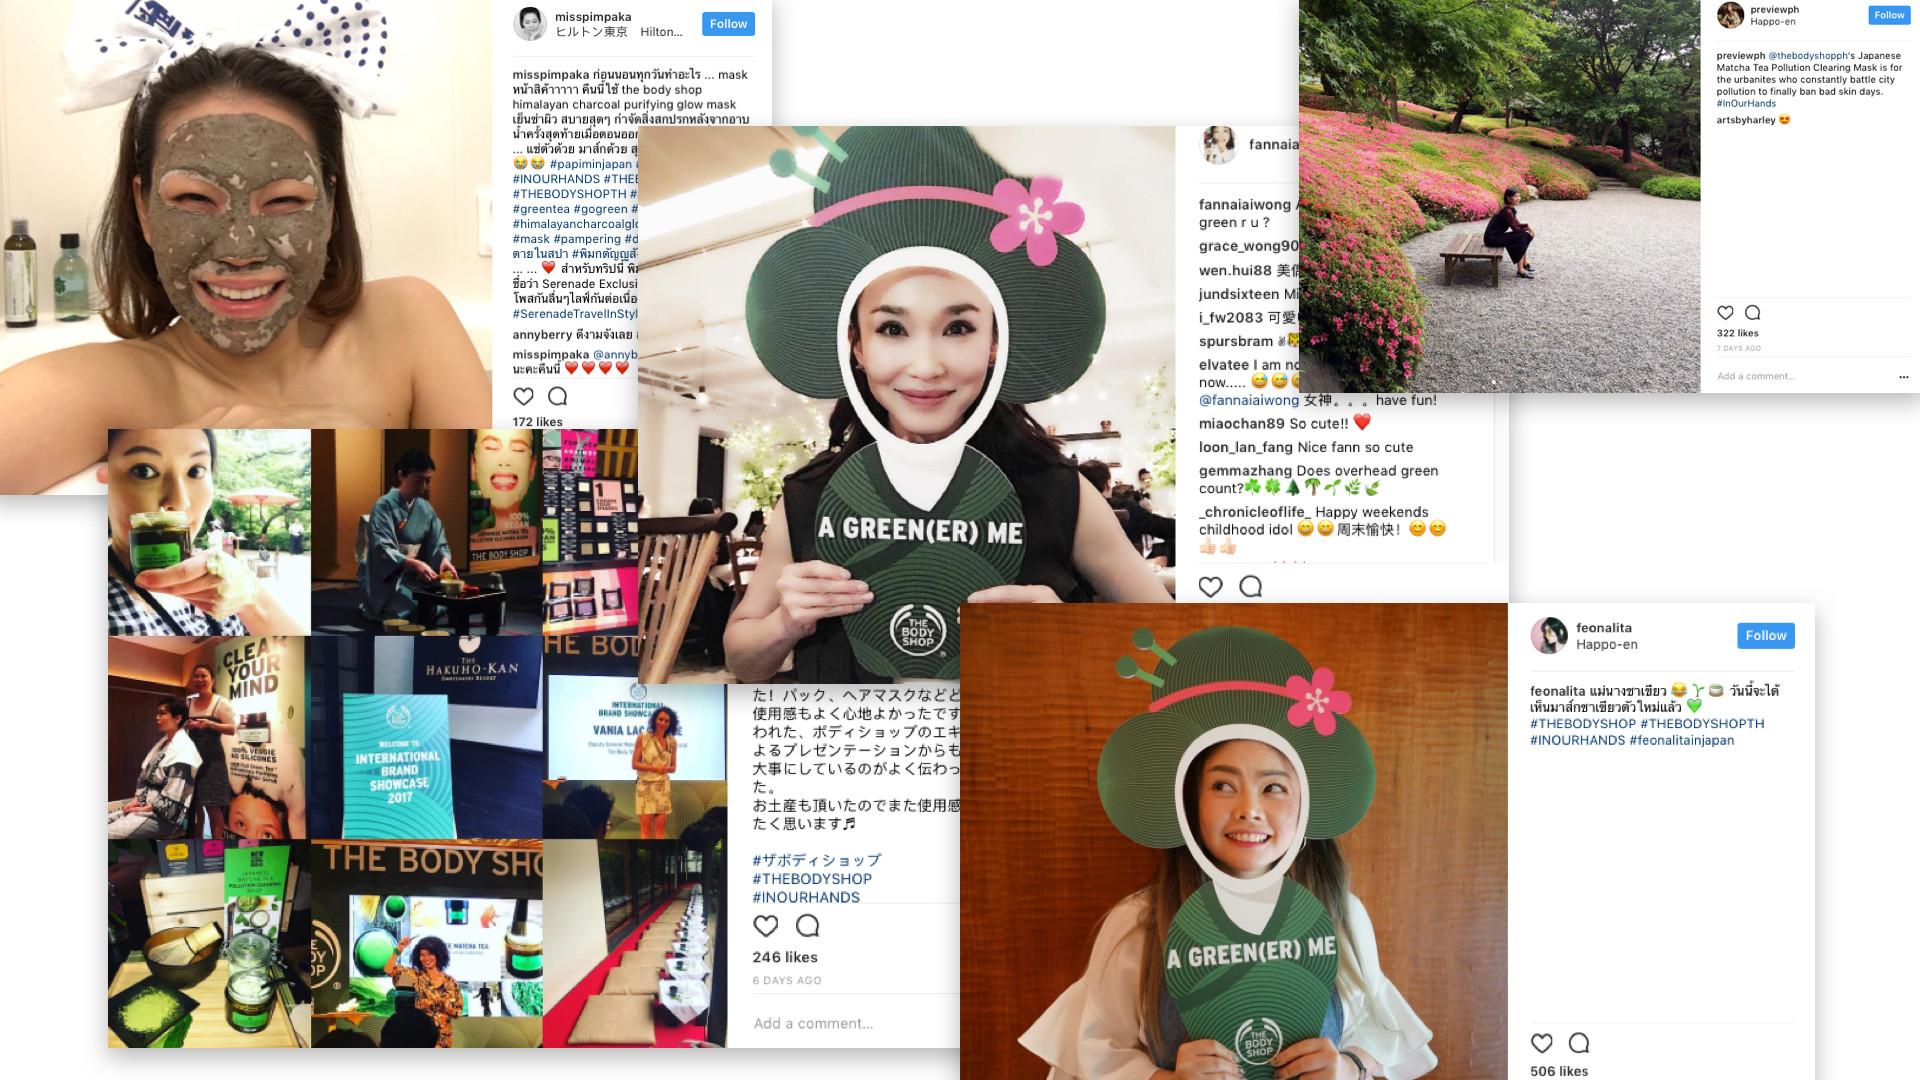 The Body Shop Tokyo Event Case Study 20170707 V2.011.jpeg